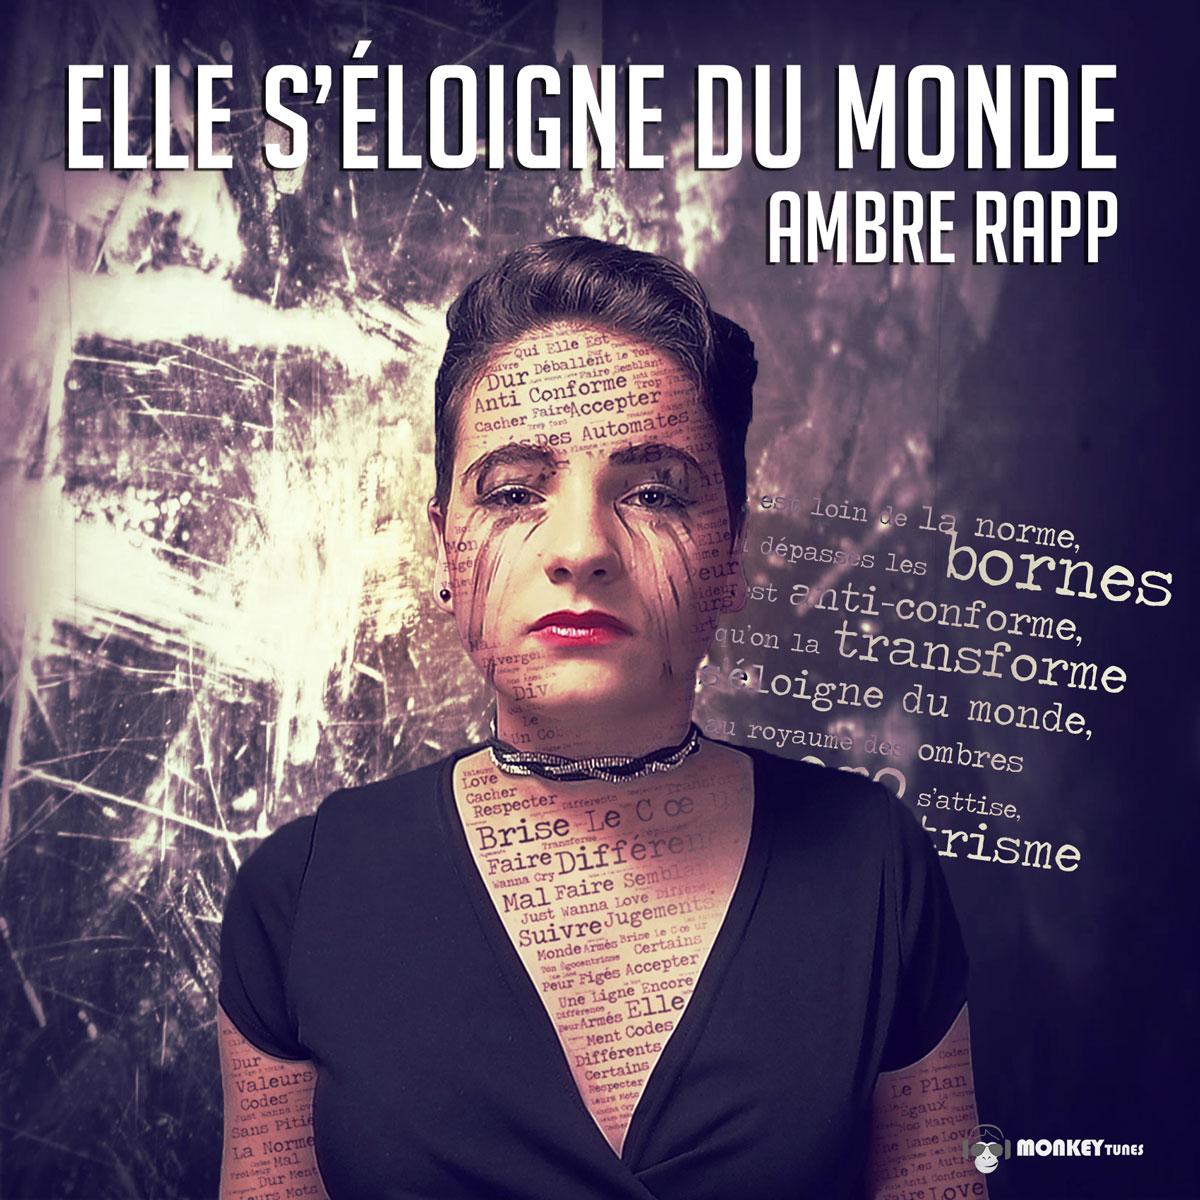 Elle s'éloigne du monde – AMBRE RAPP (radio edit)